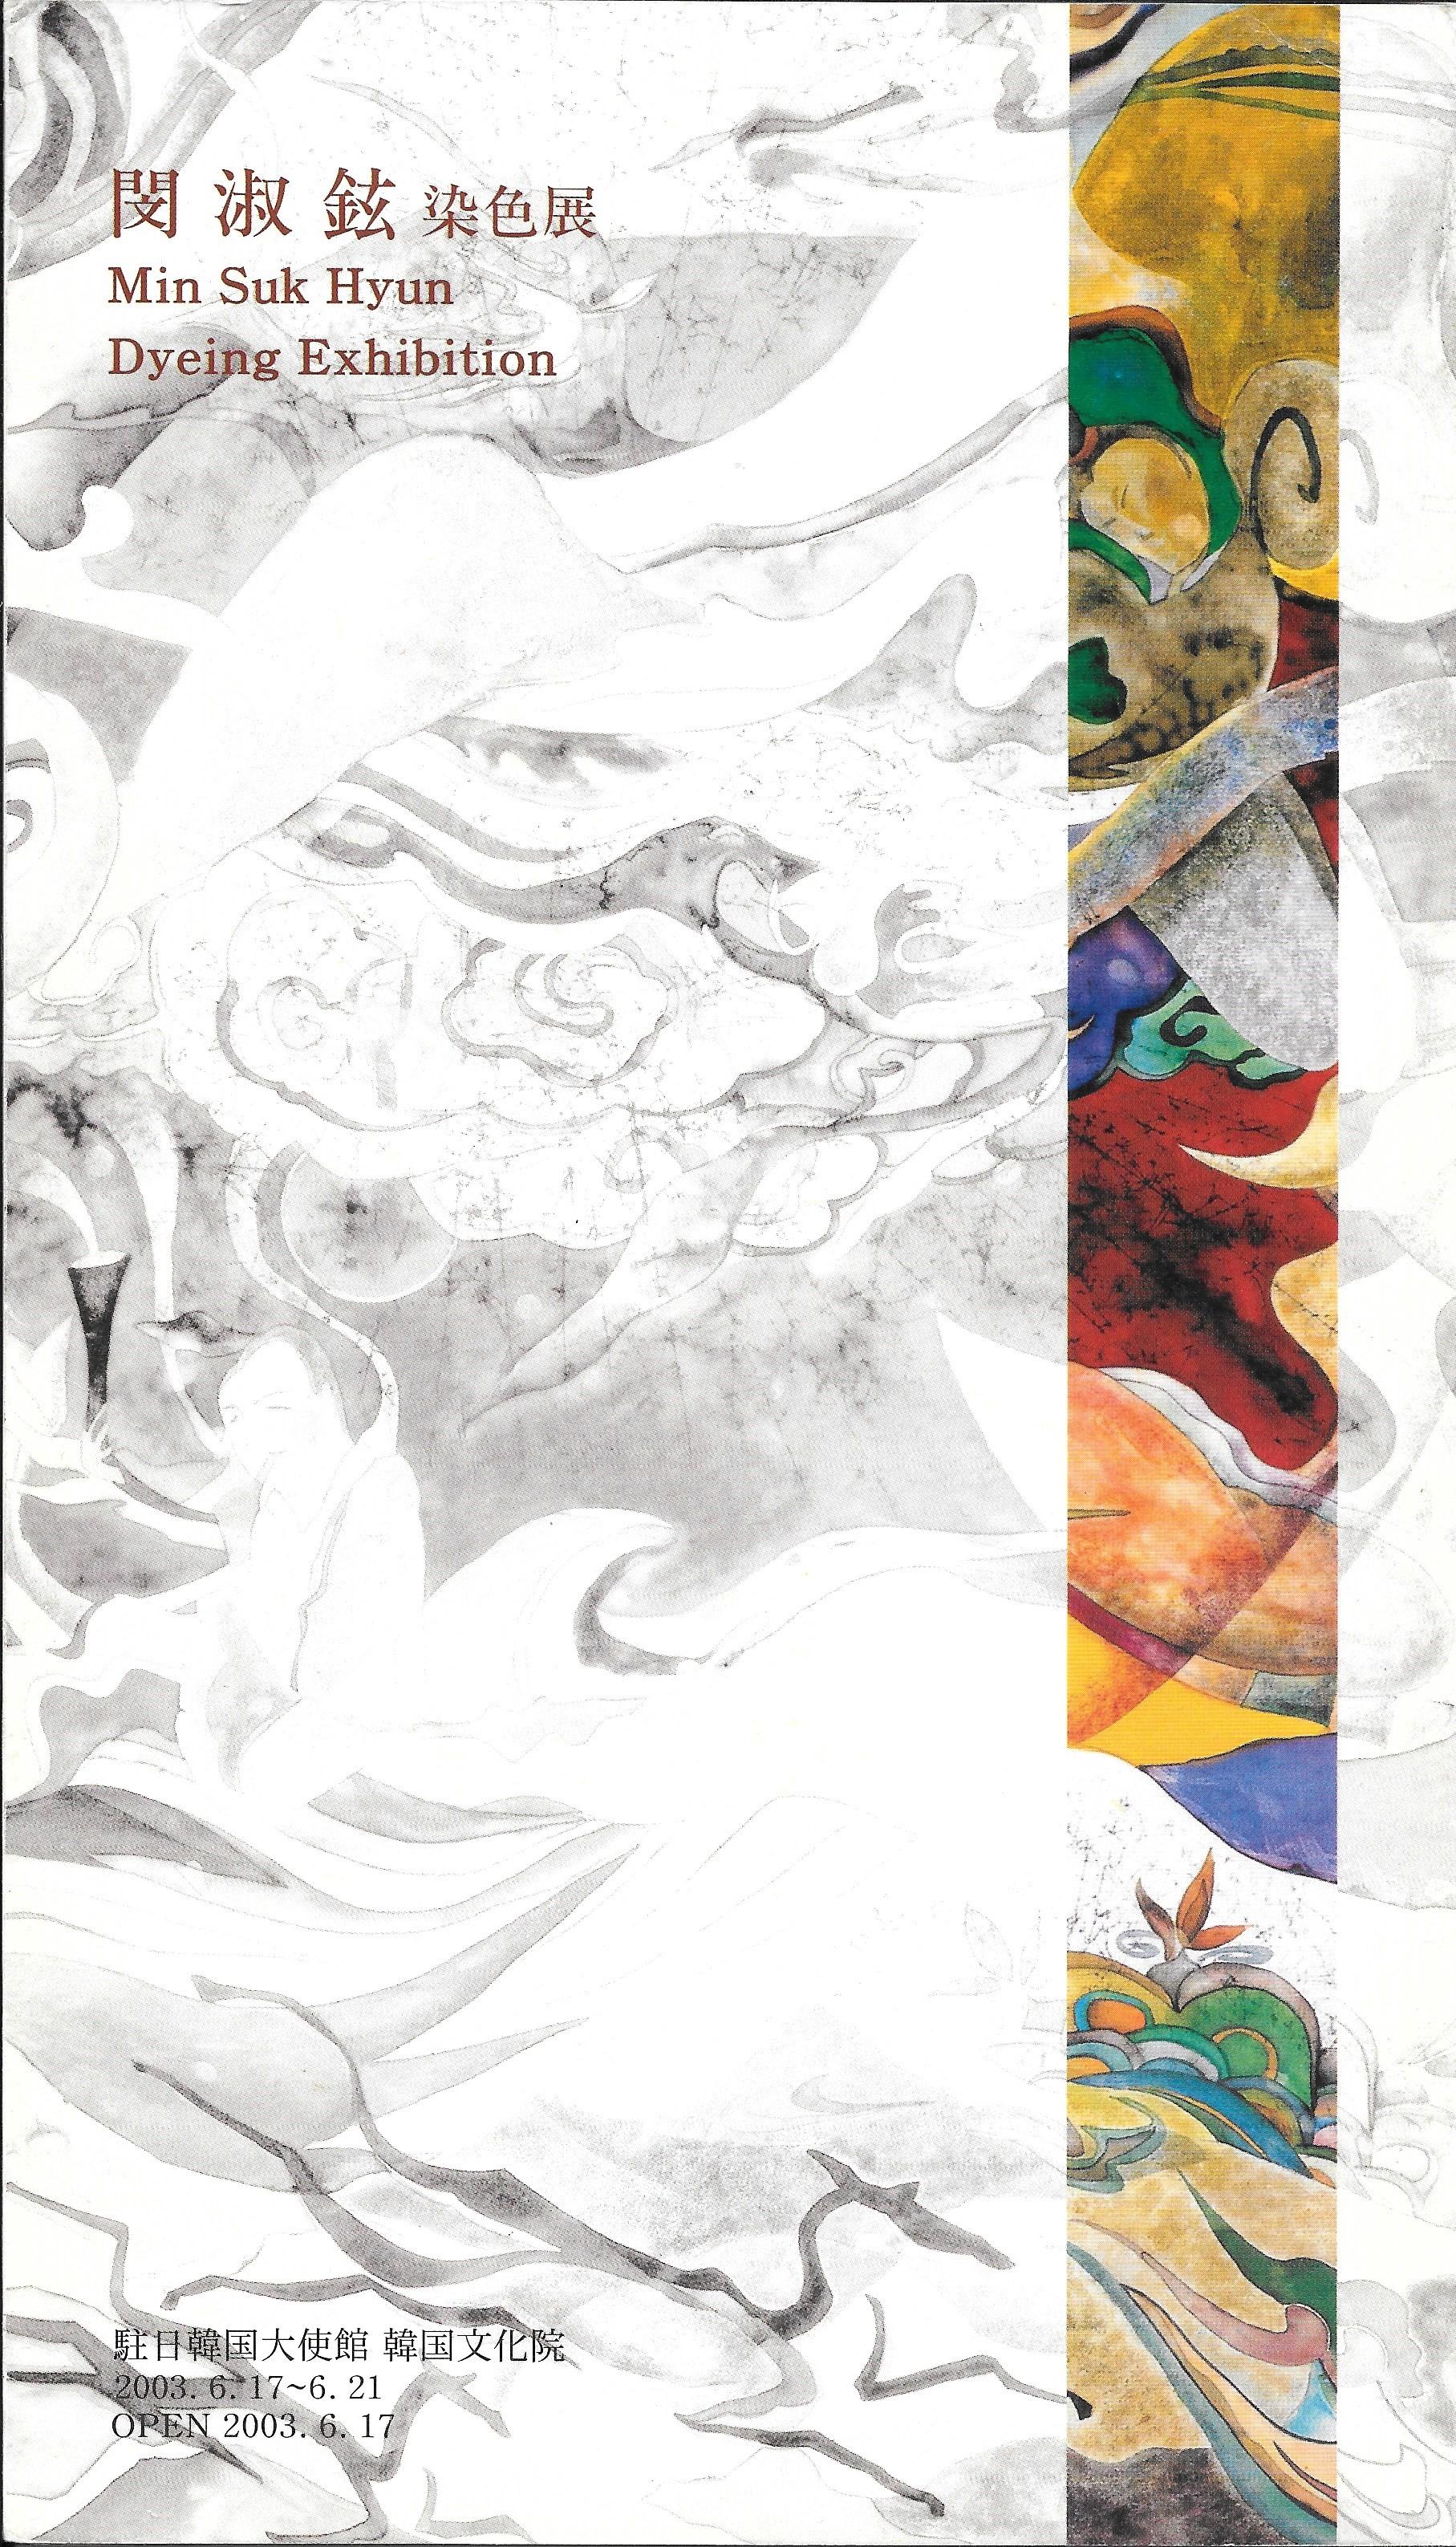 2003. korea culture center invitational Exhibition.